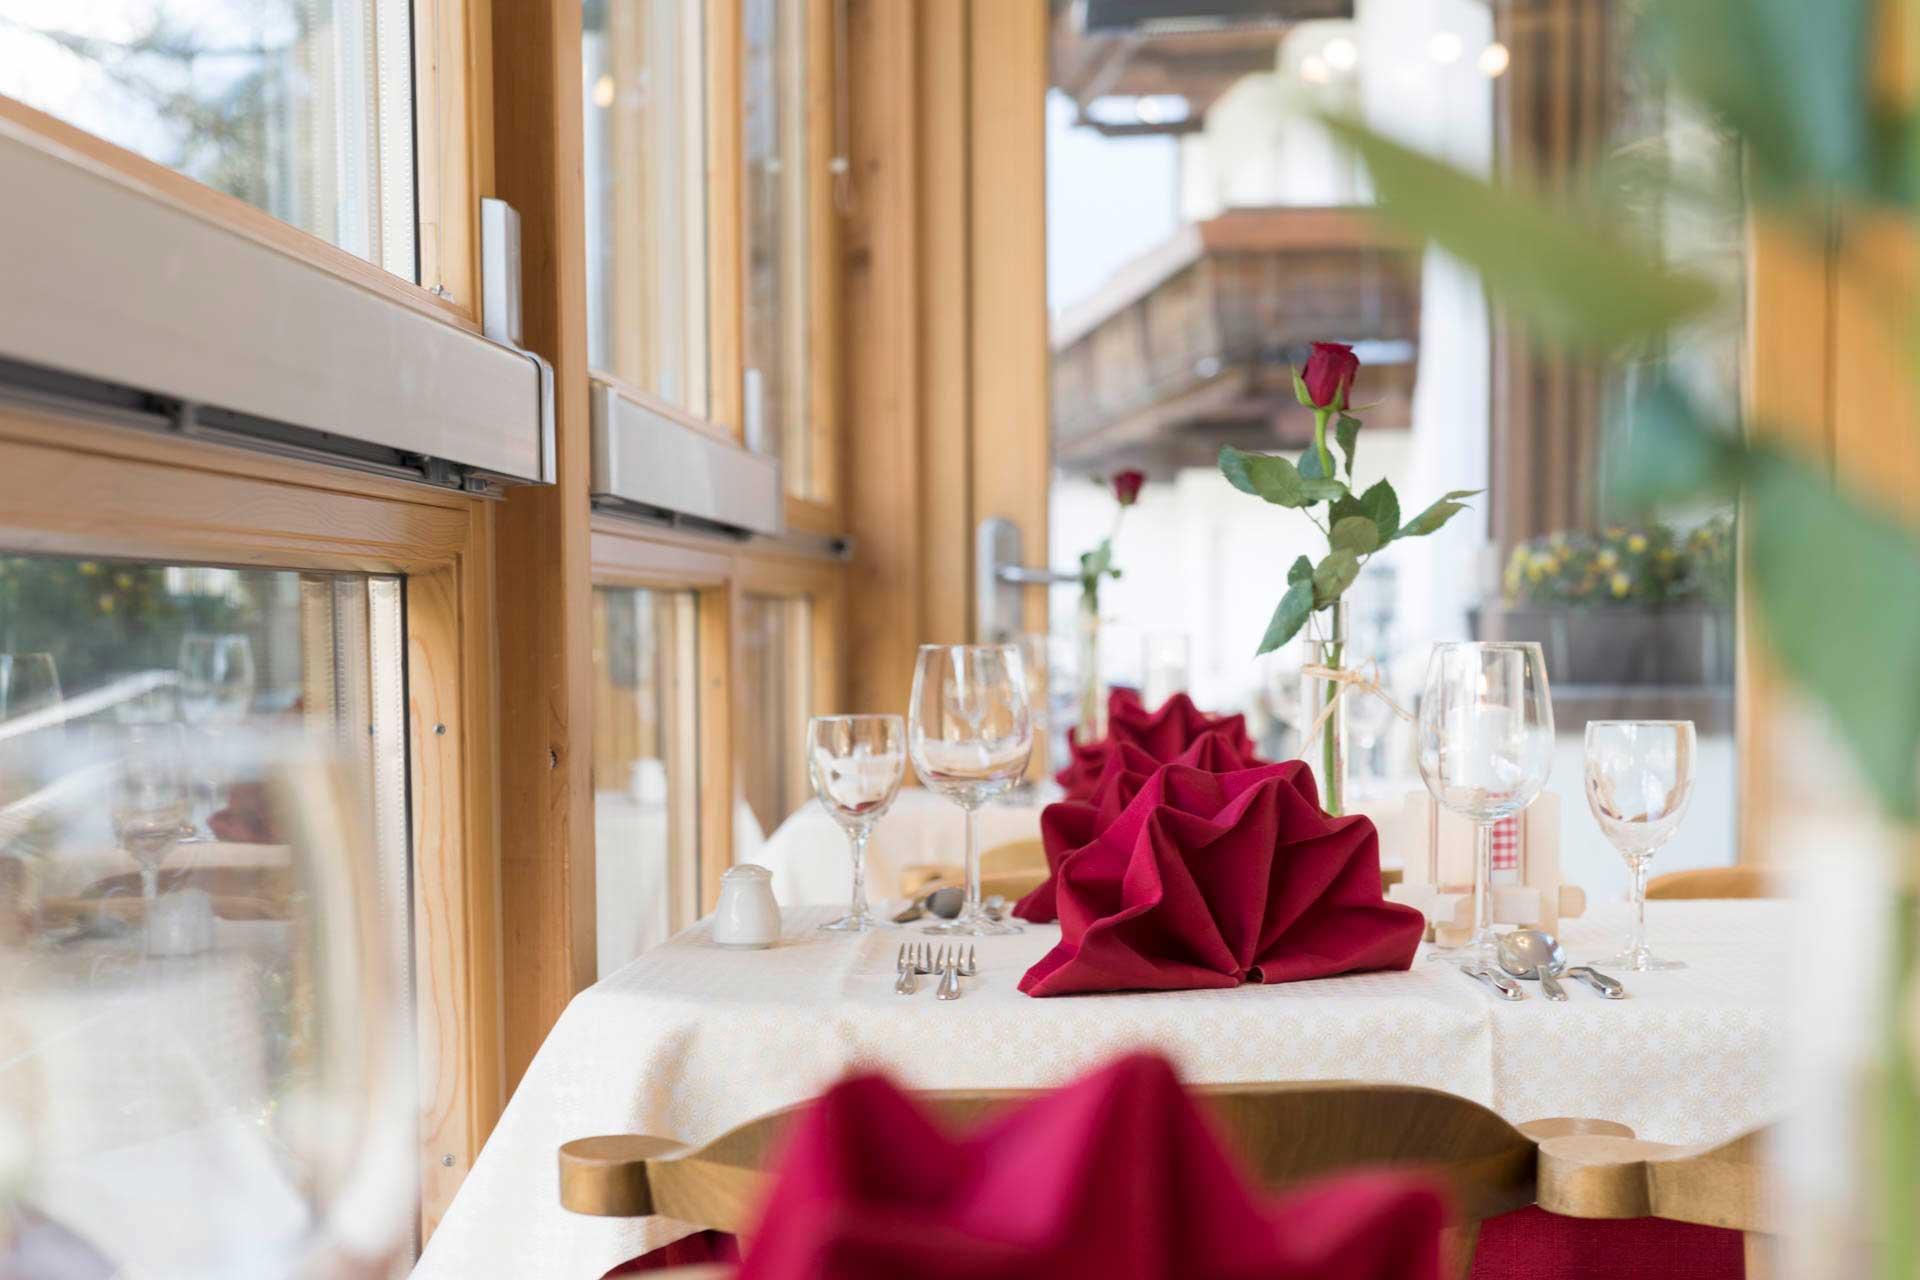 Hotel-Angelika-Galerie-Speisesaal-festlich-close-up